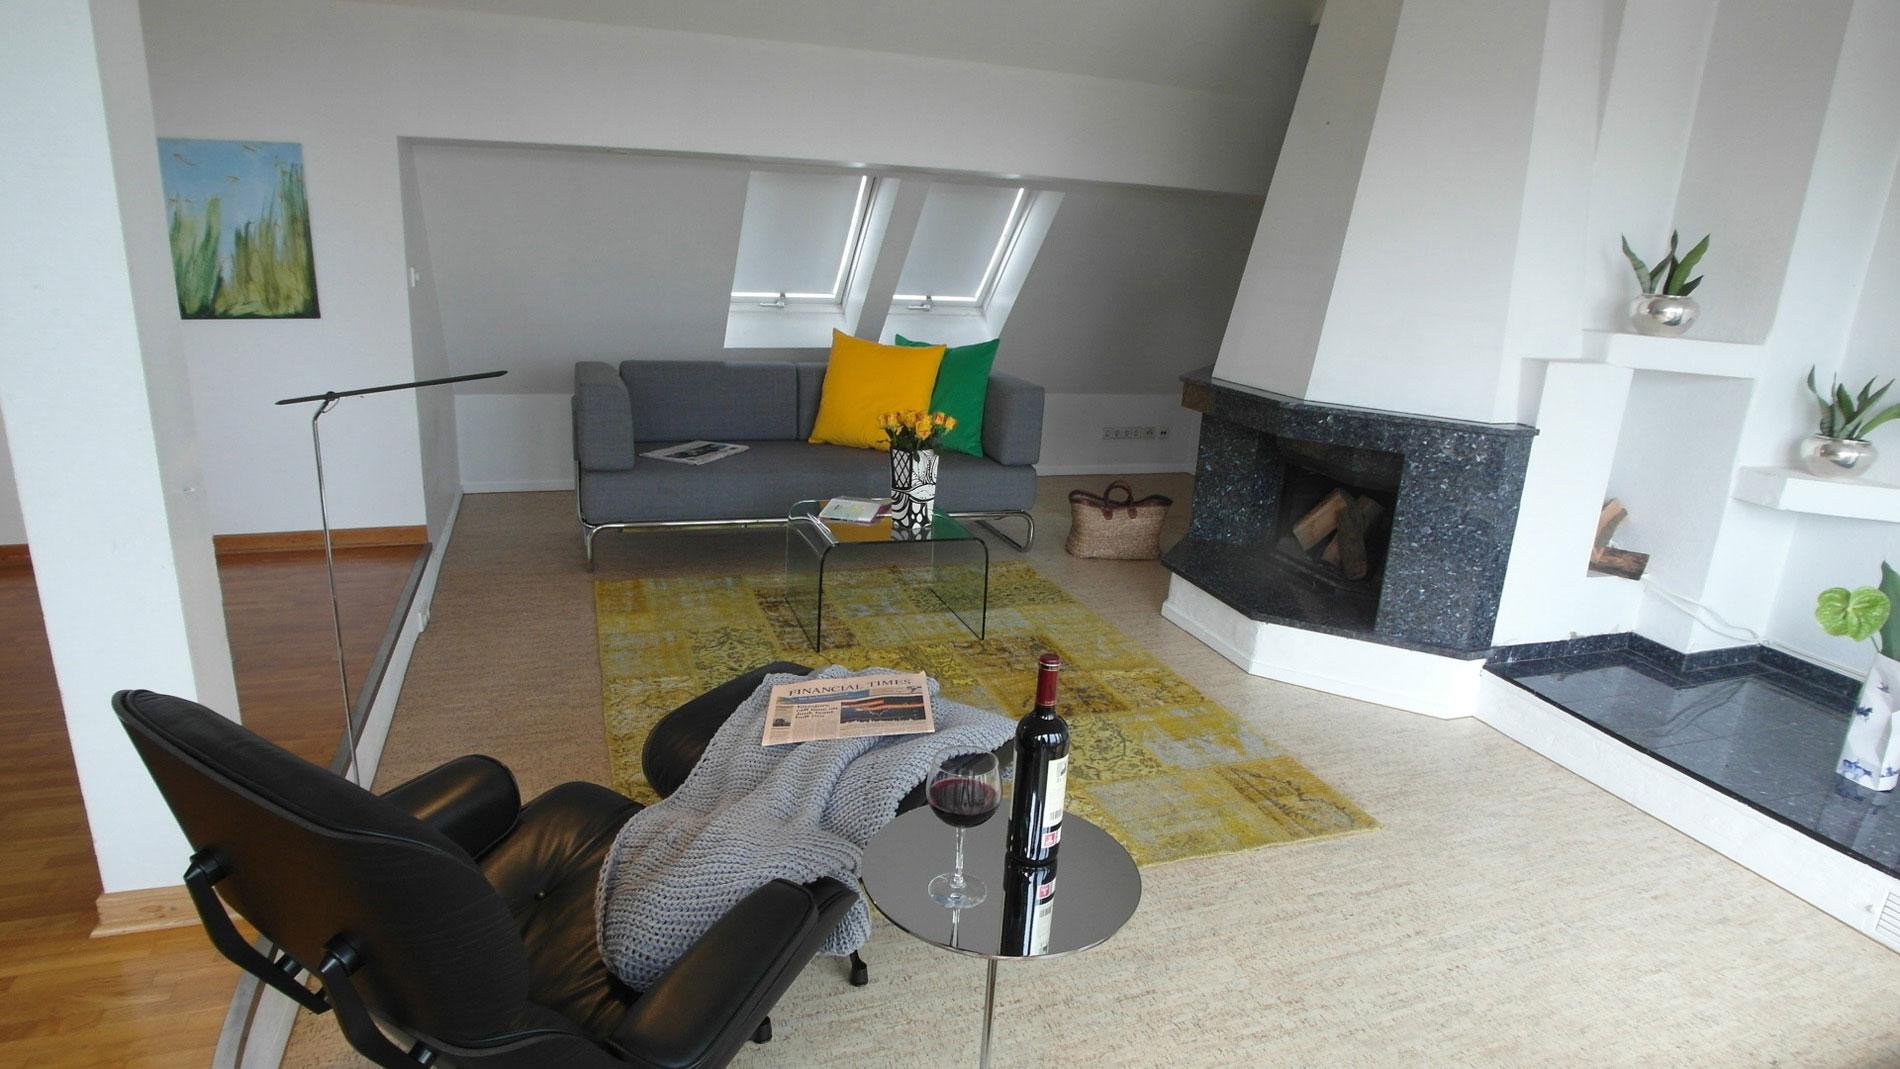 impressum stilvertrauen hannover by ulrike krasemann. Black Bedroom Furniture Sets. Home Design Ideas